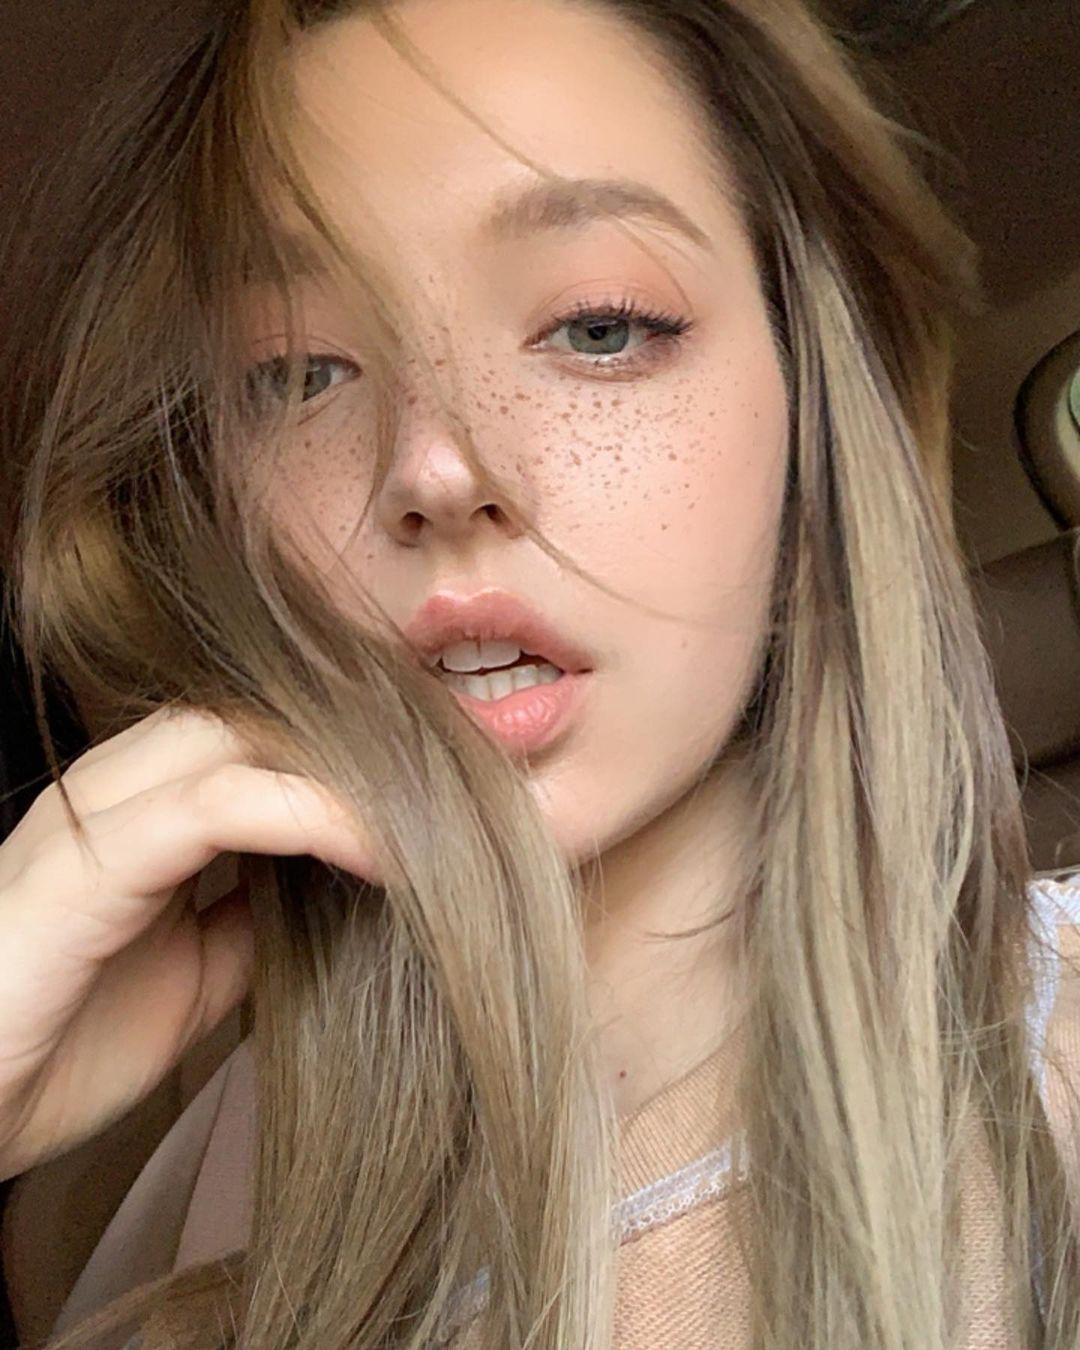 Angelina-Danilova-Wallpapers-Insta-Fit-Bio-14